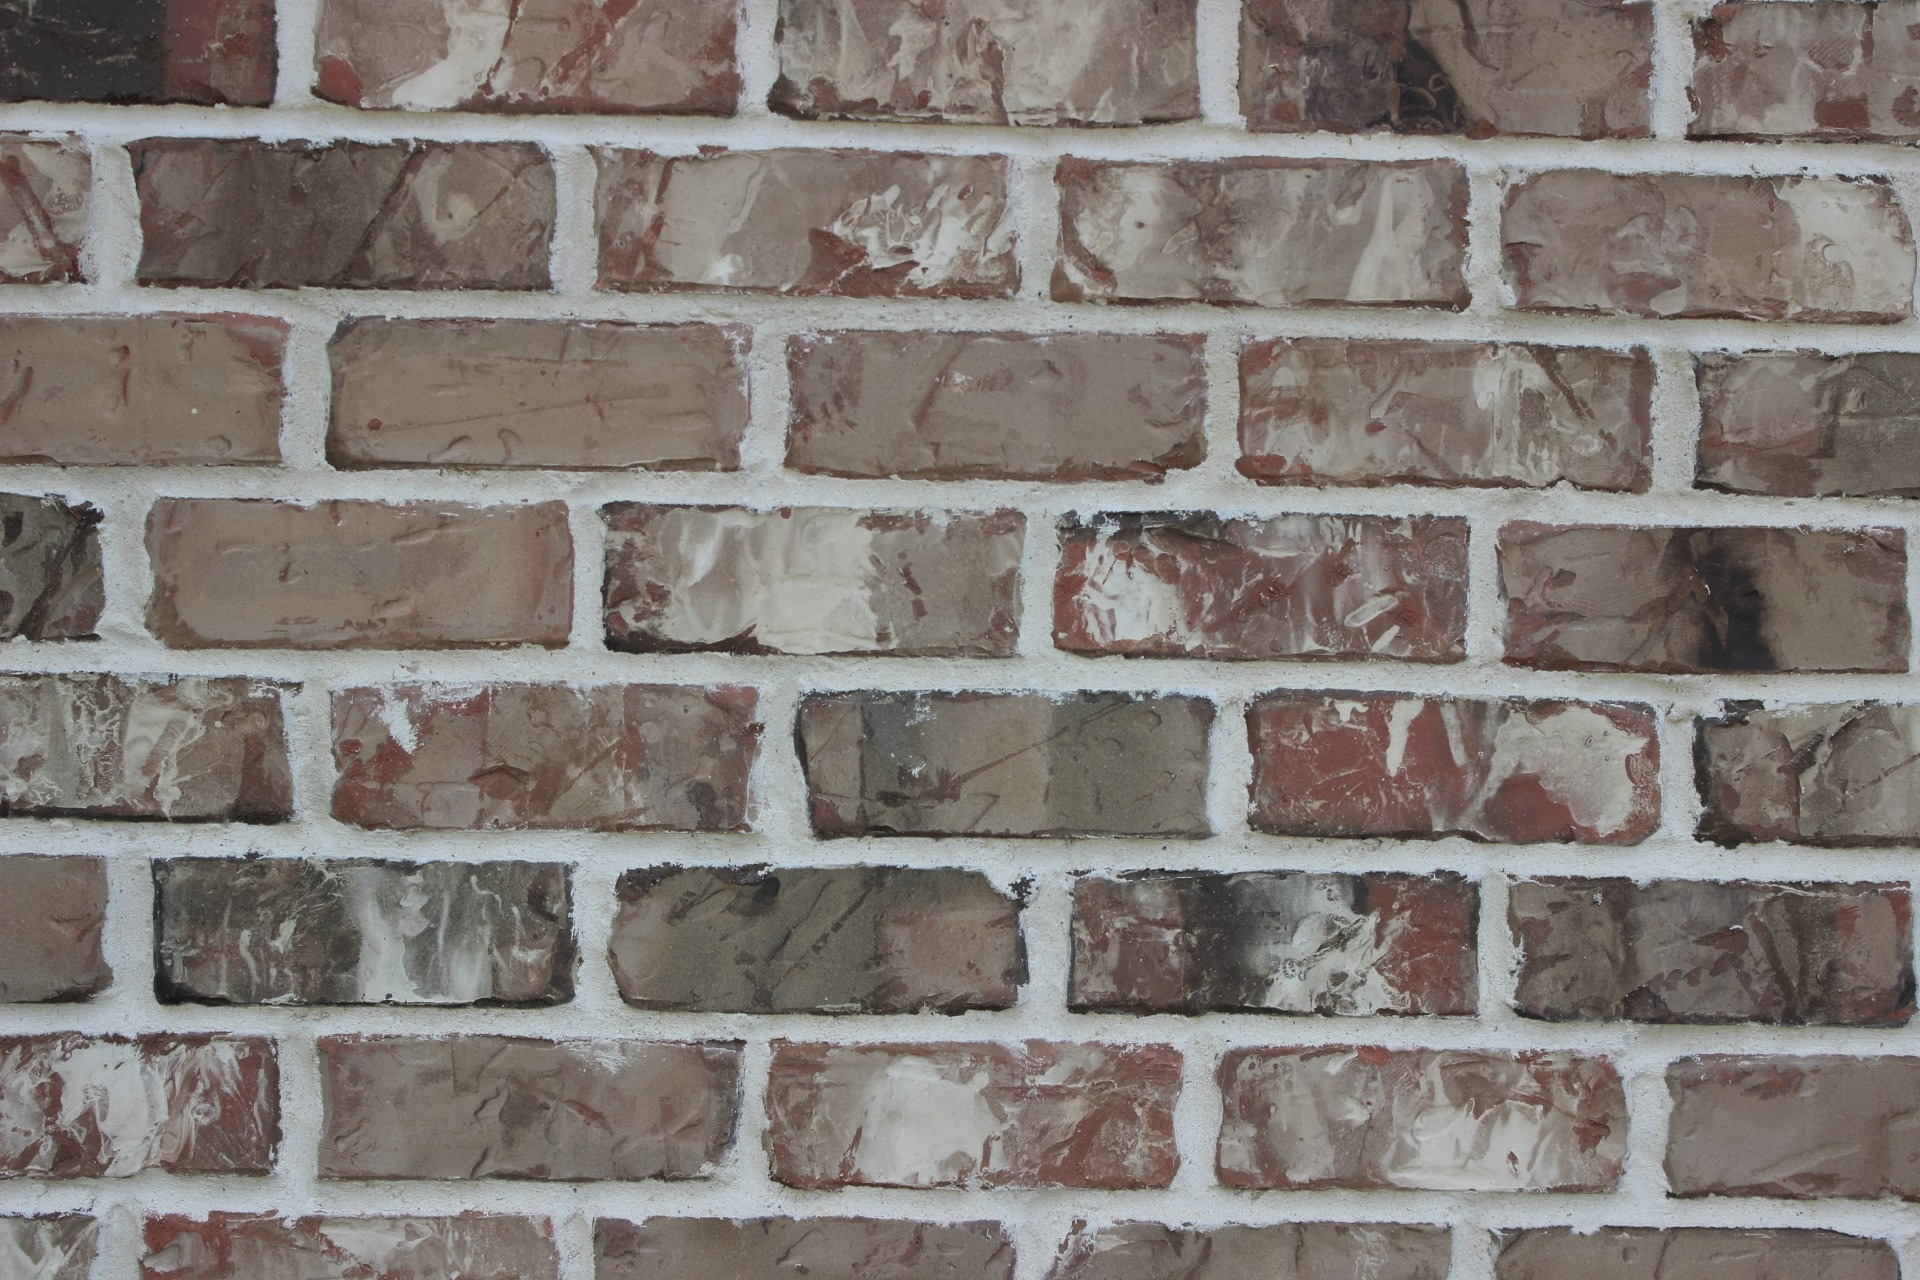 Southern Antique Brick